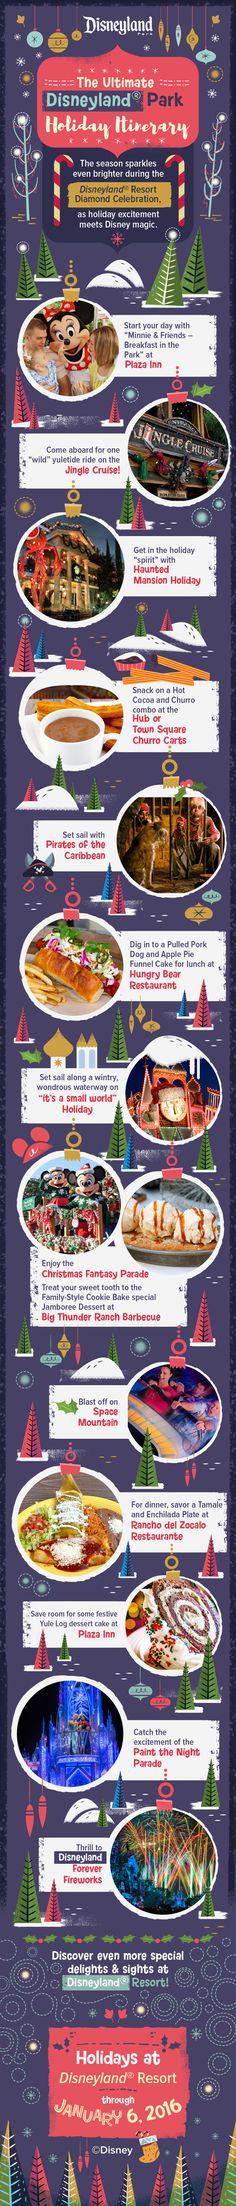 Make the season bright with this dazzling holiday itinerary at Disneyland Park!